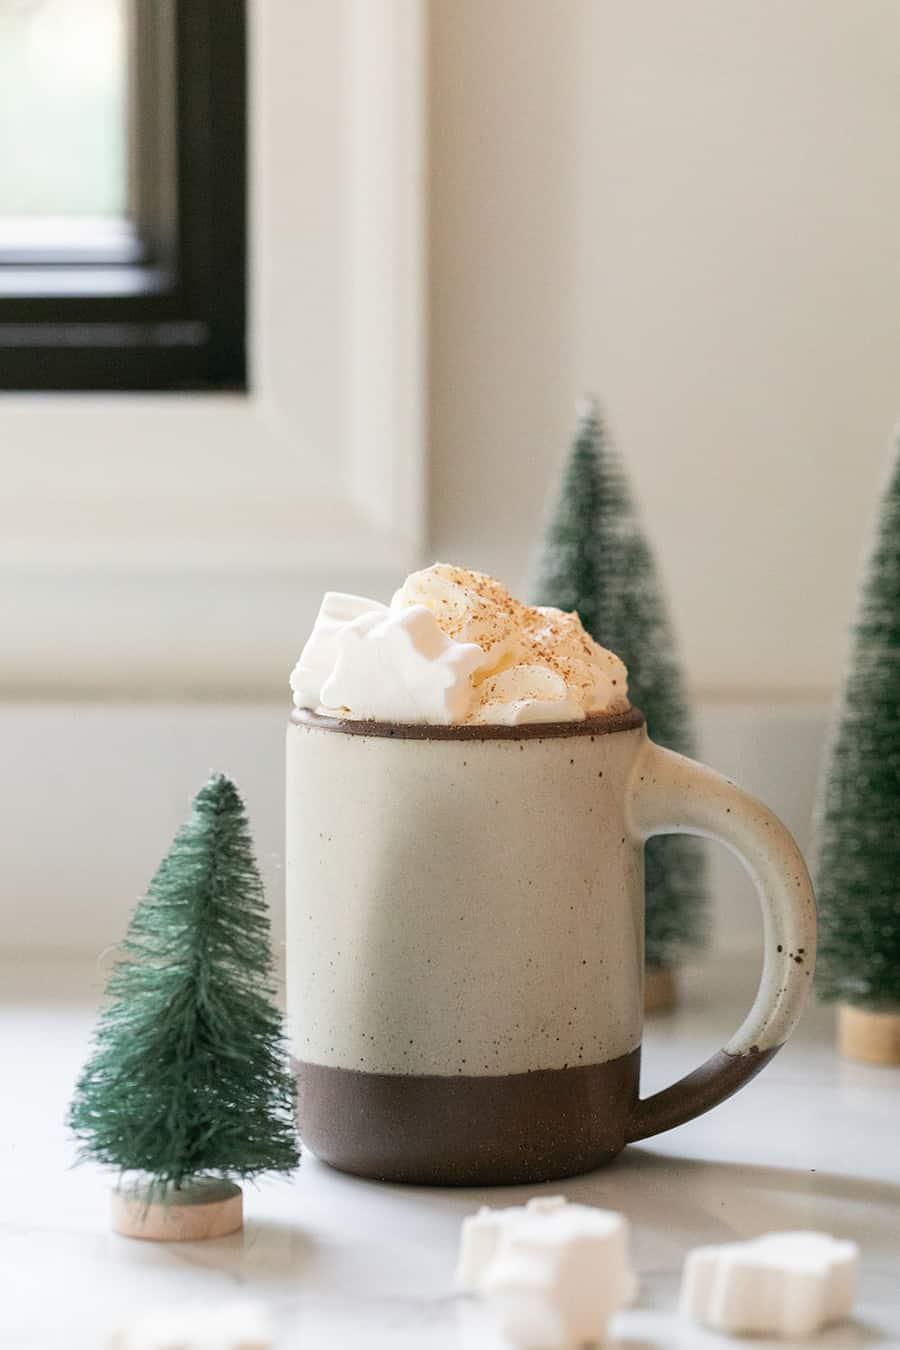 Mug filled with hot chocolate recipe